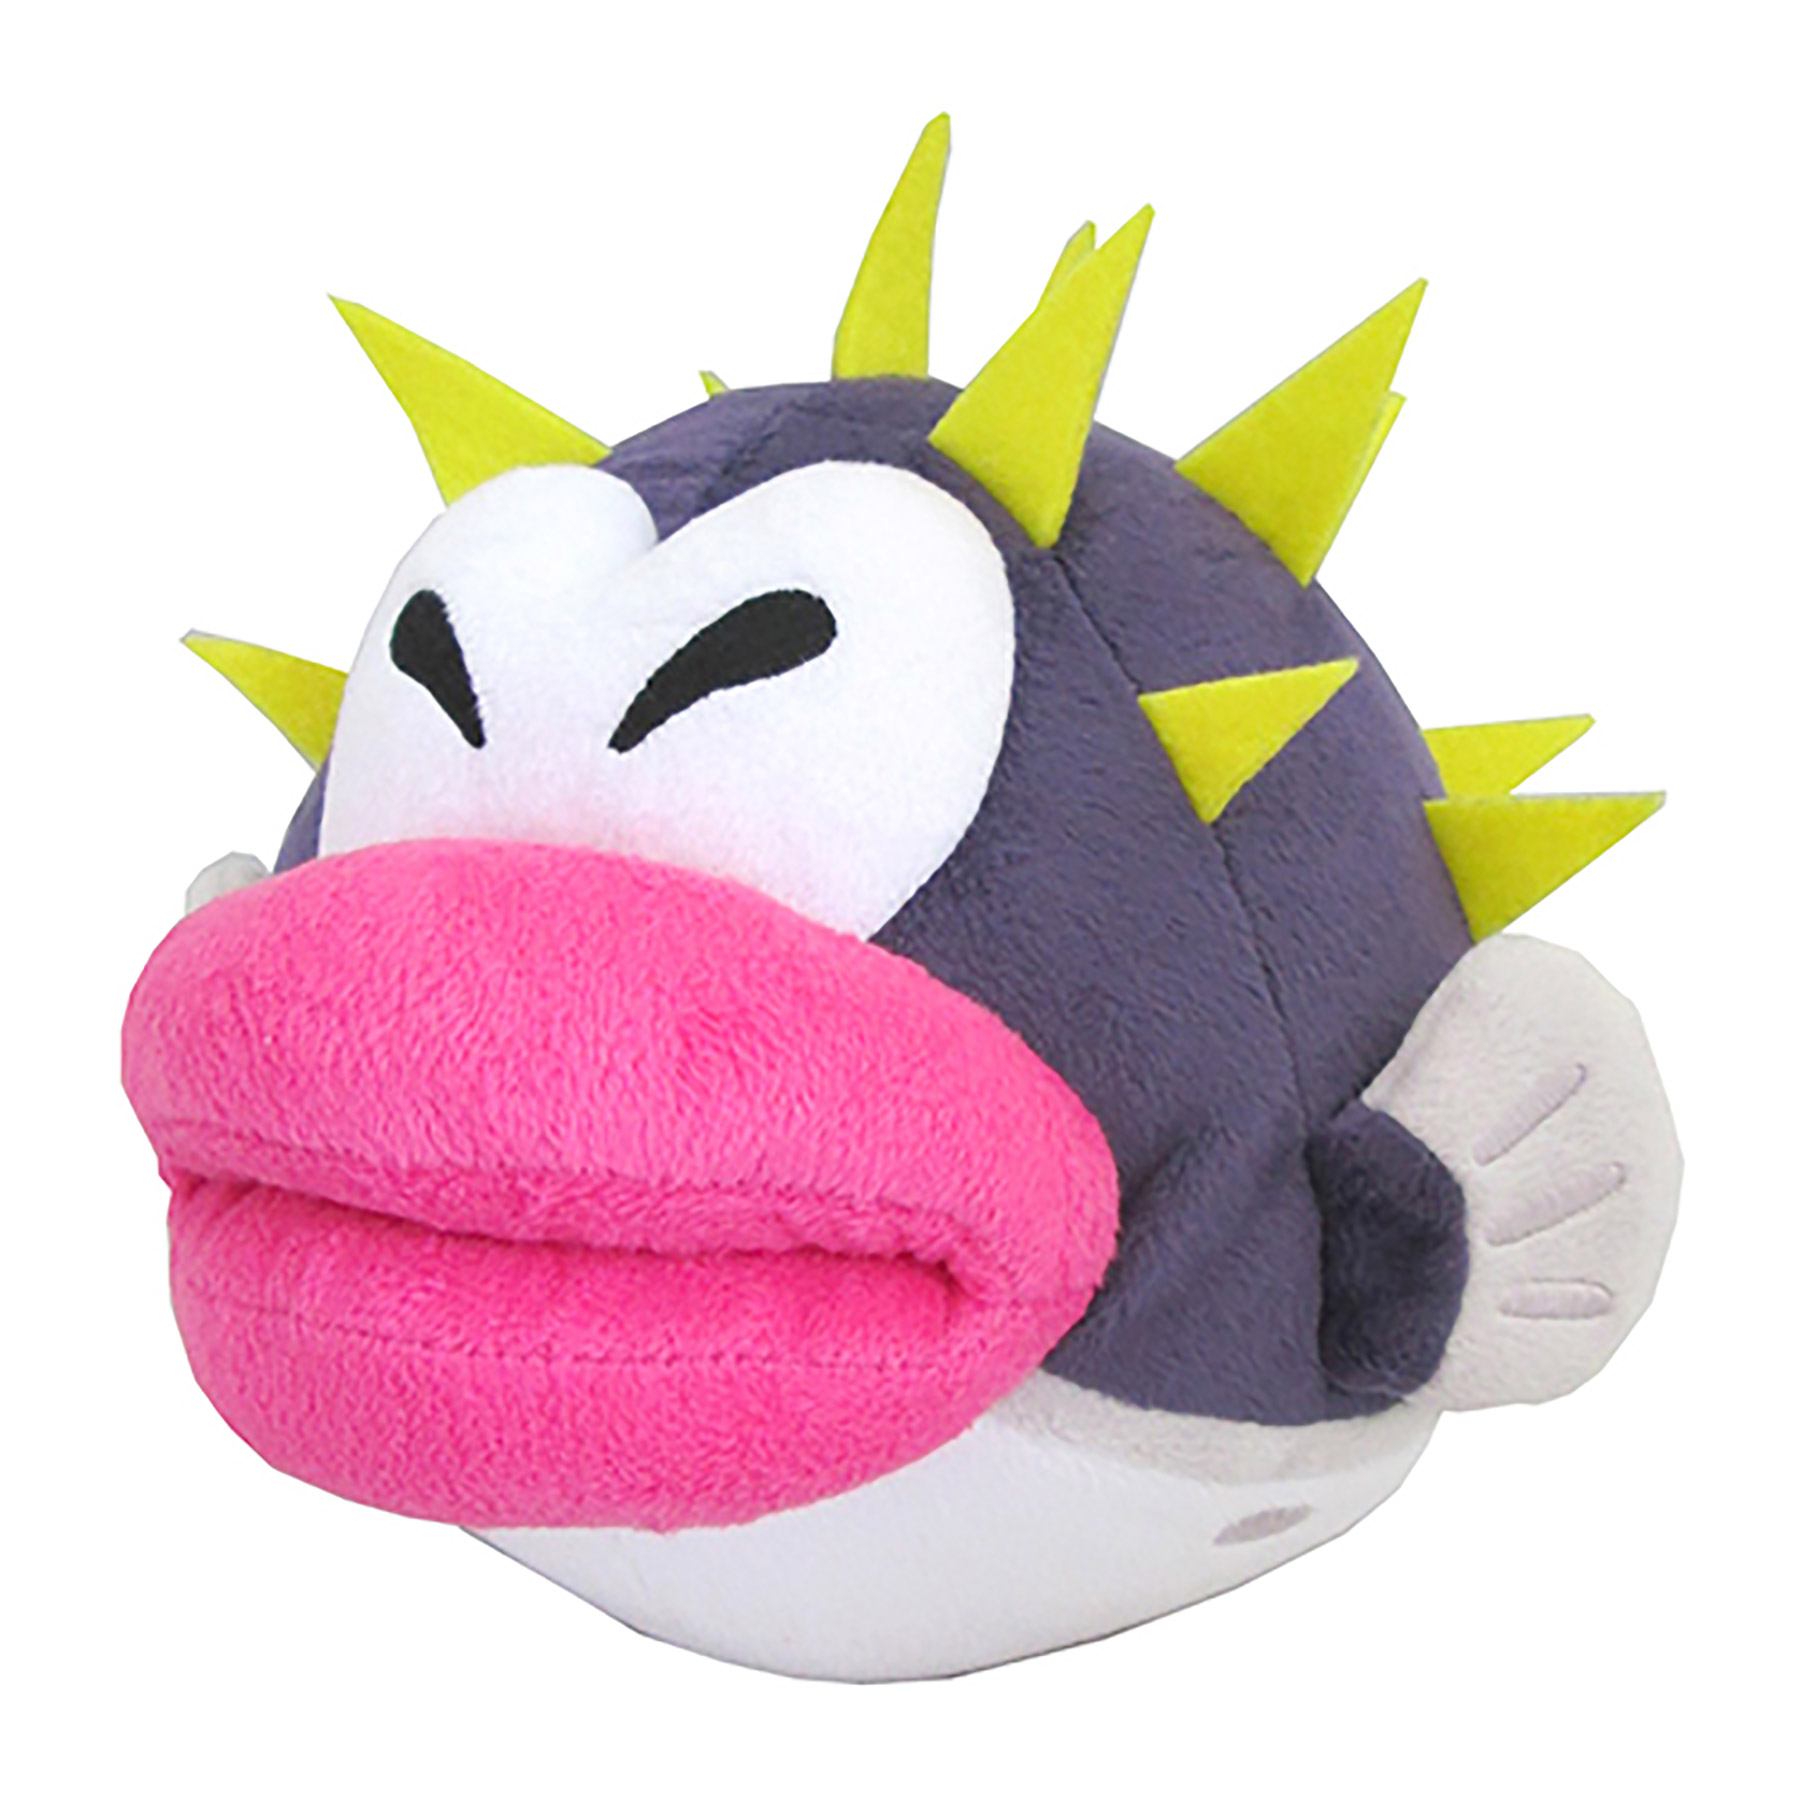 Porcupuffer Super Mario Character Plush Toy 7 Nintendo